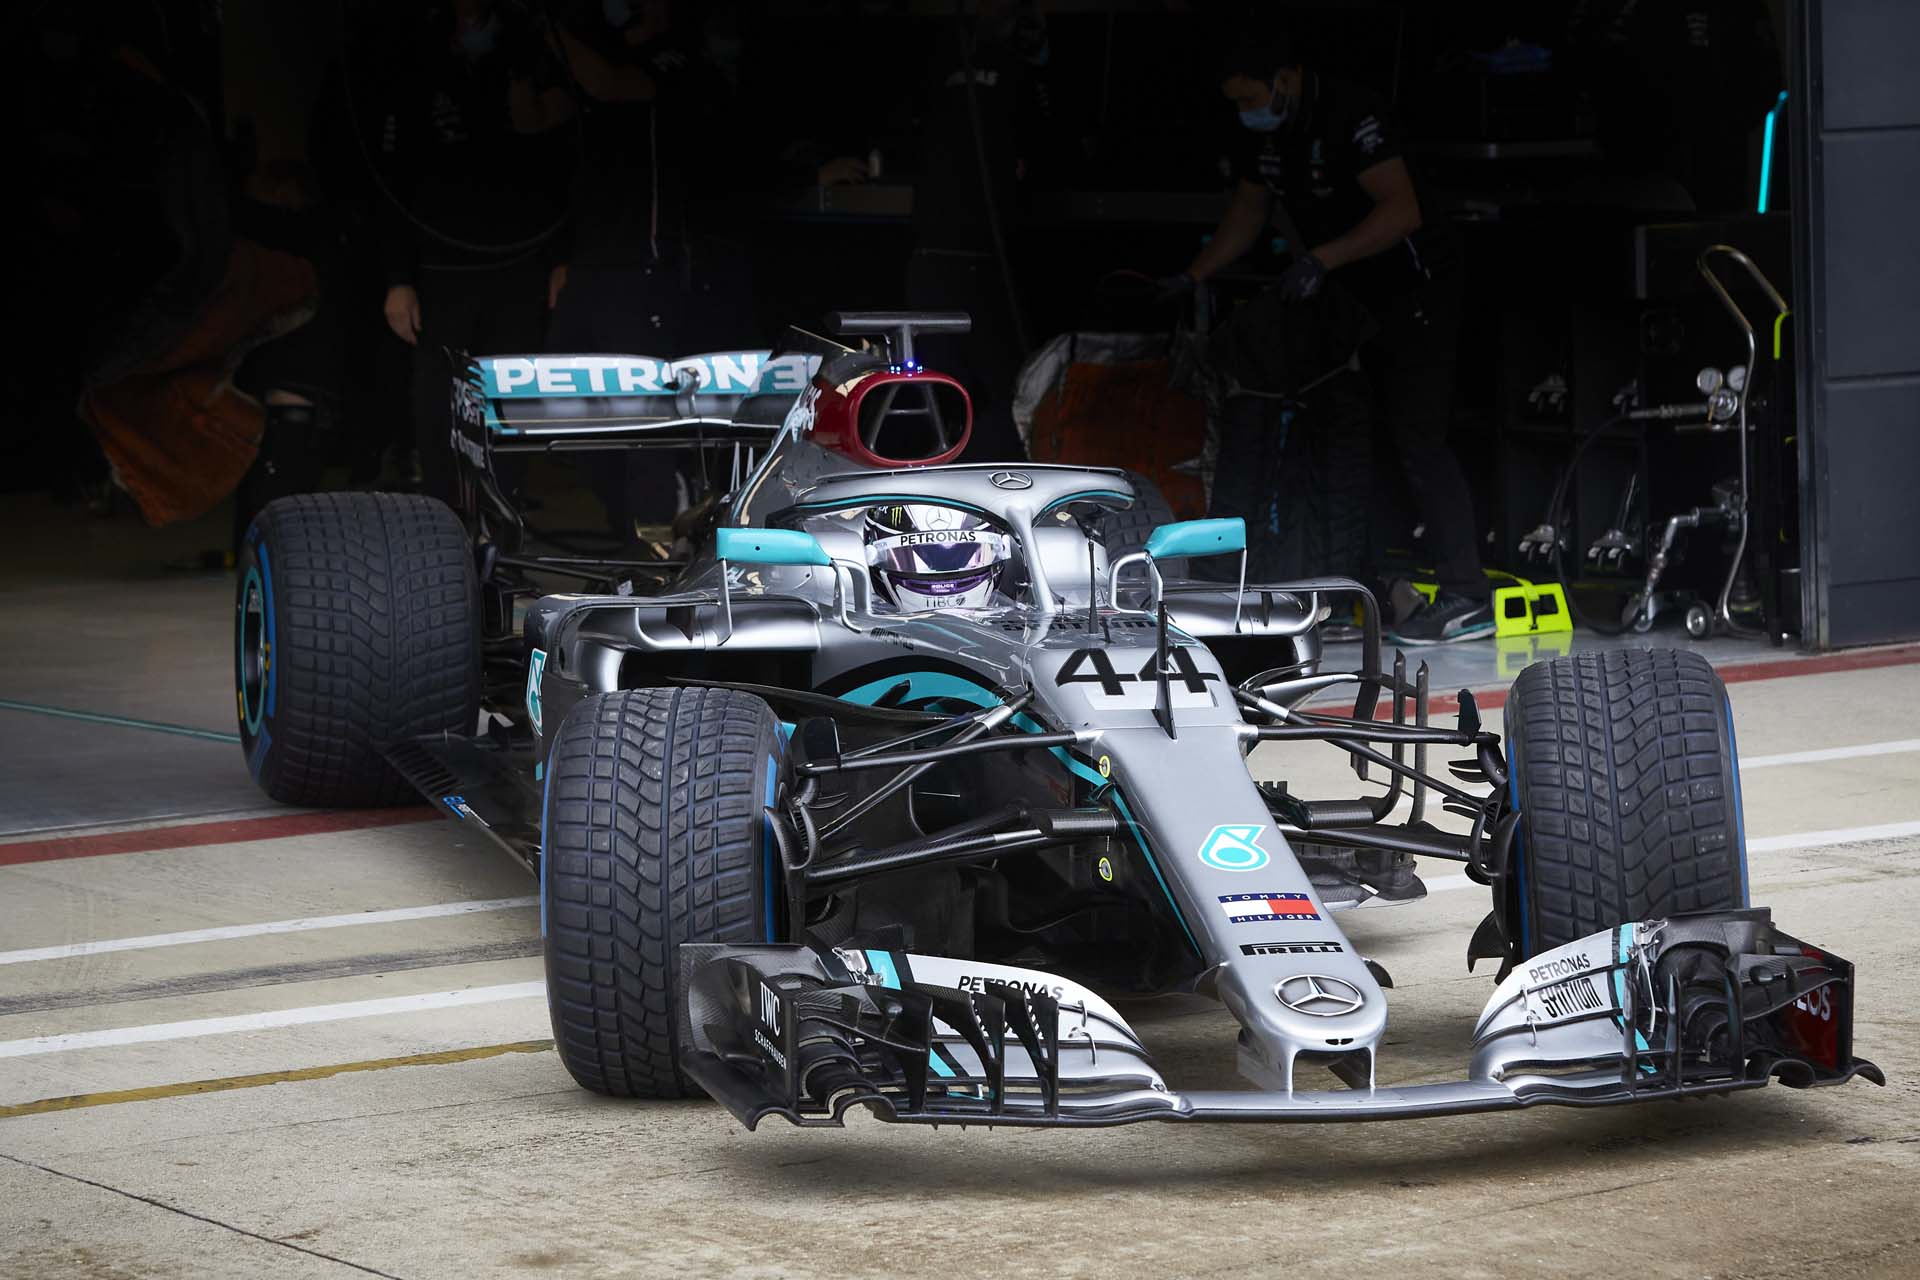 Silverstone Test, Day 2 - Steve Etherington